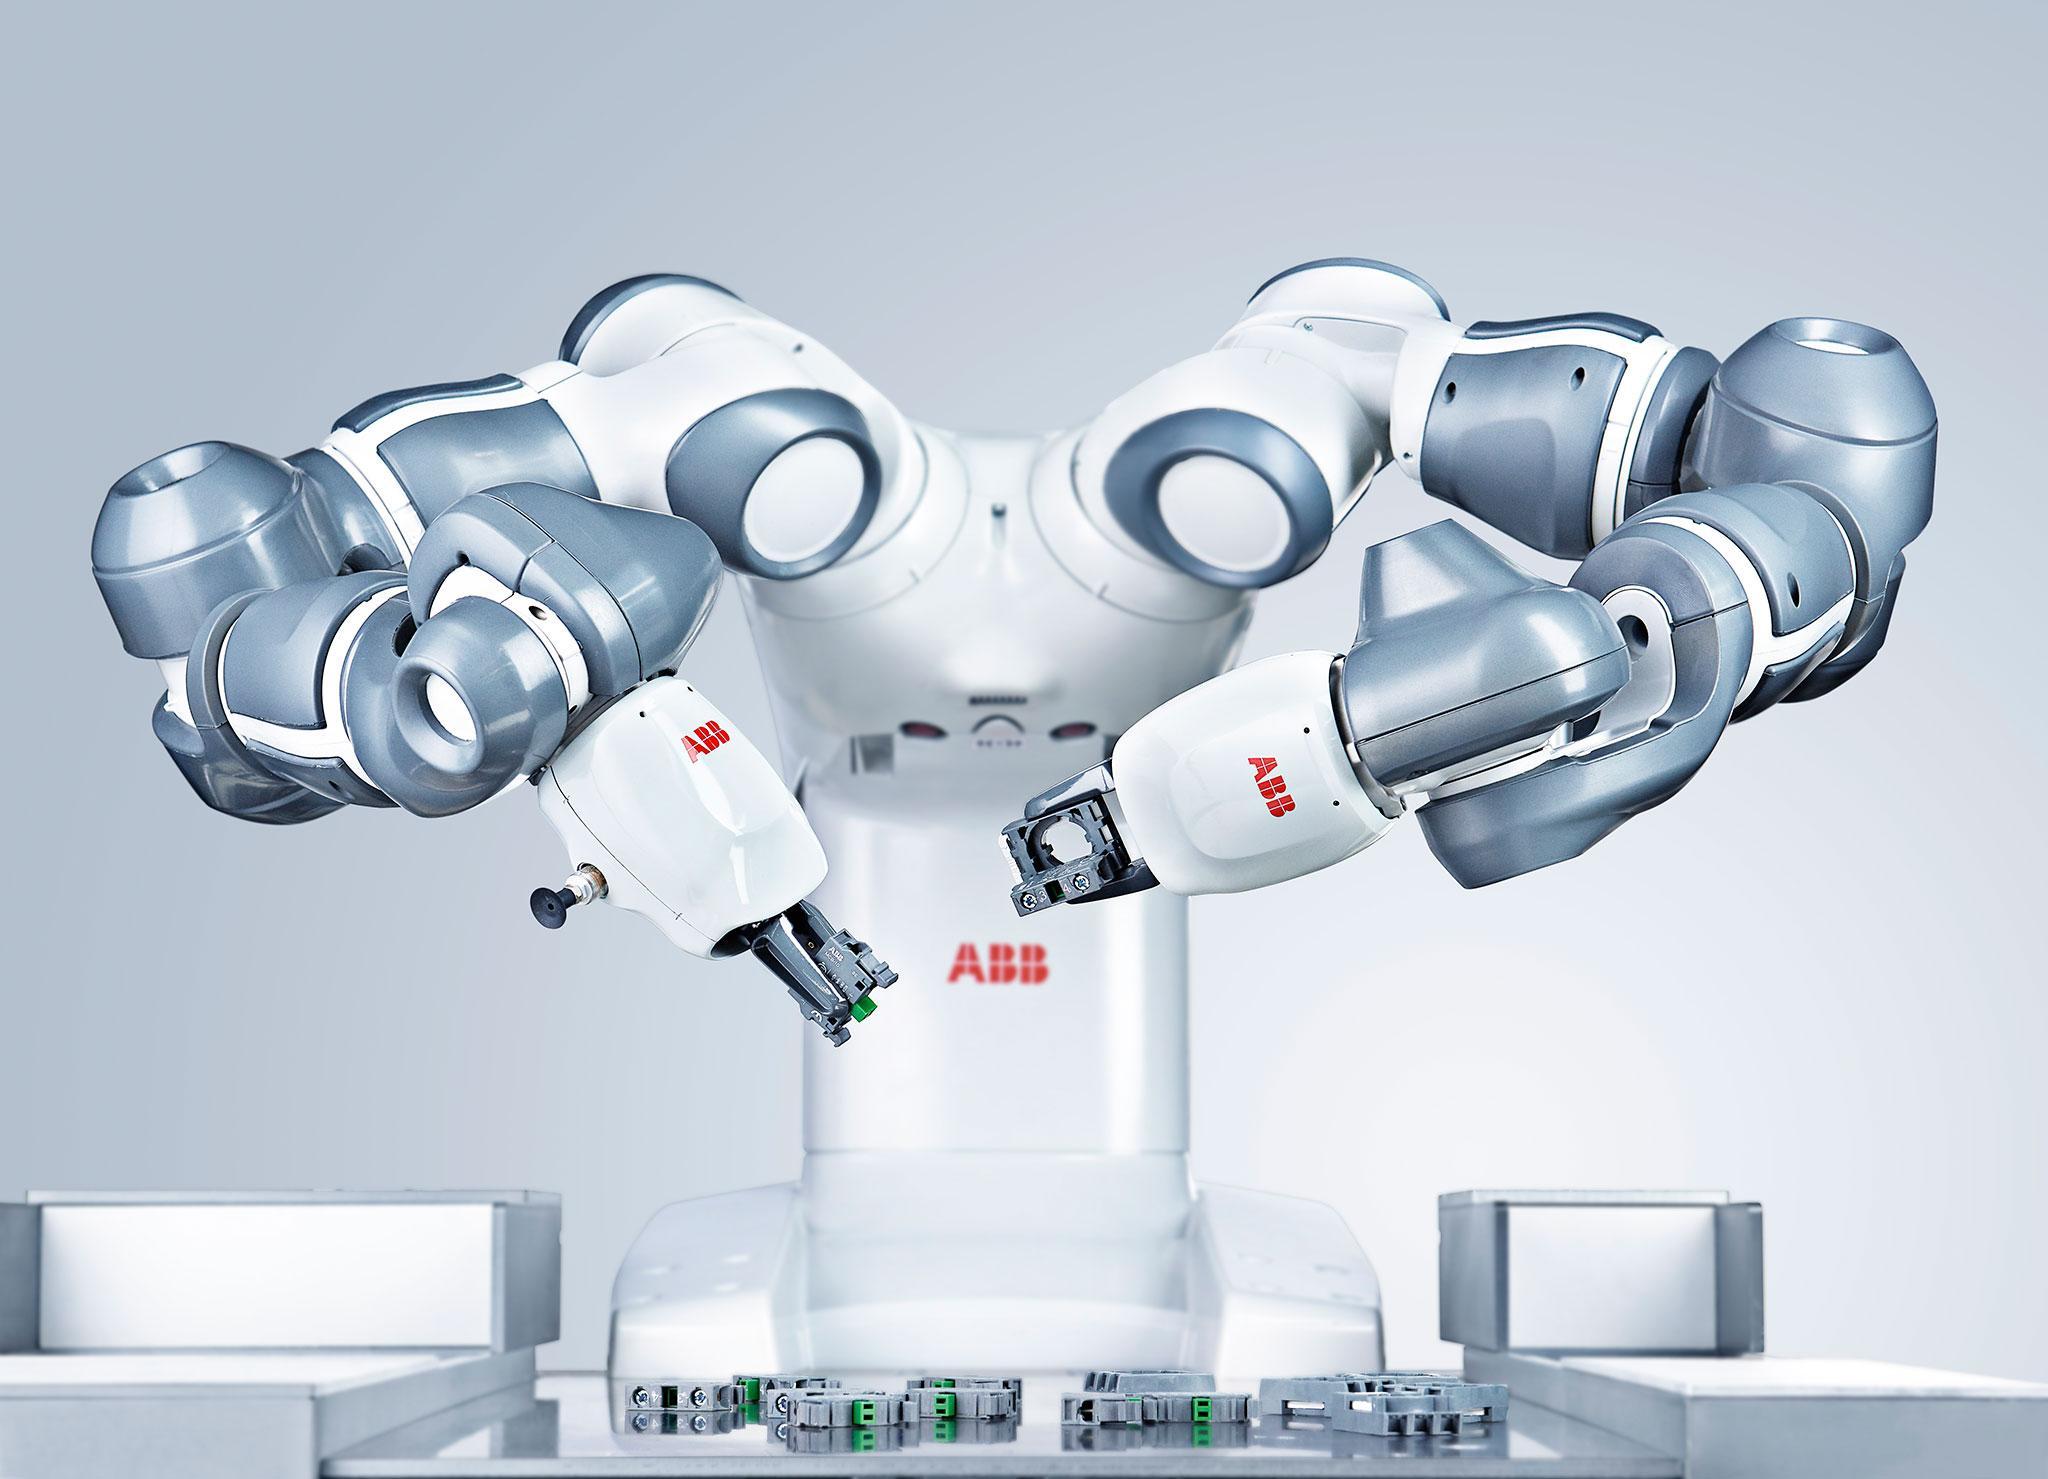 Httproboticsandautomationnewsorgans on chips 2015 06 abb yumi robotg fandeluxe Choice Image